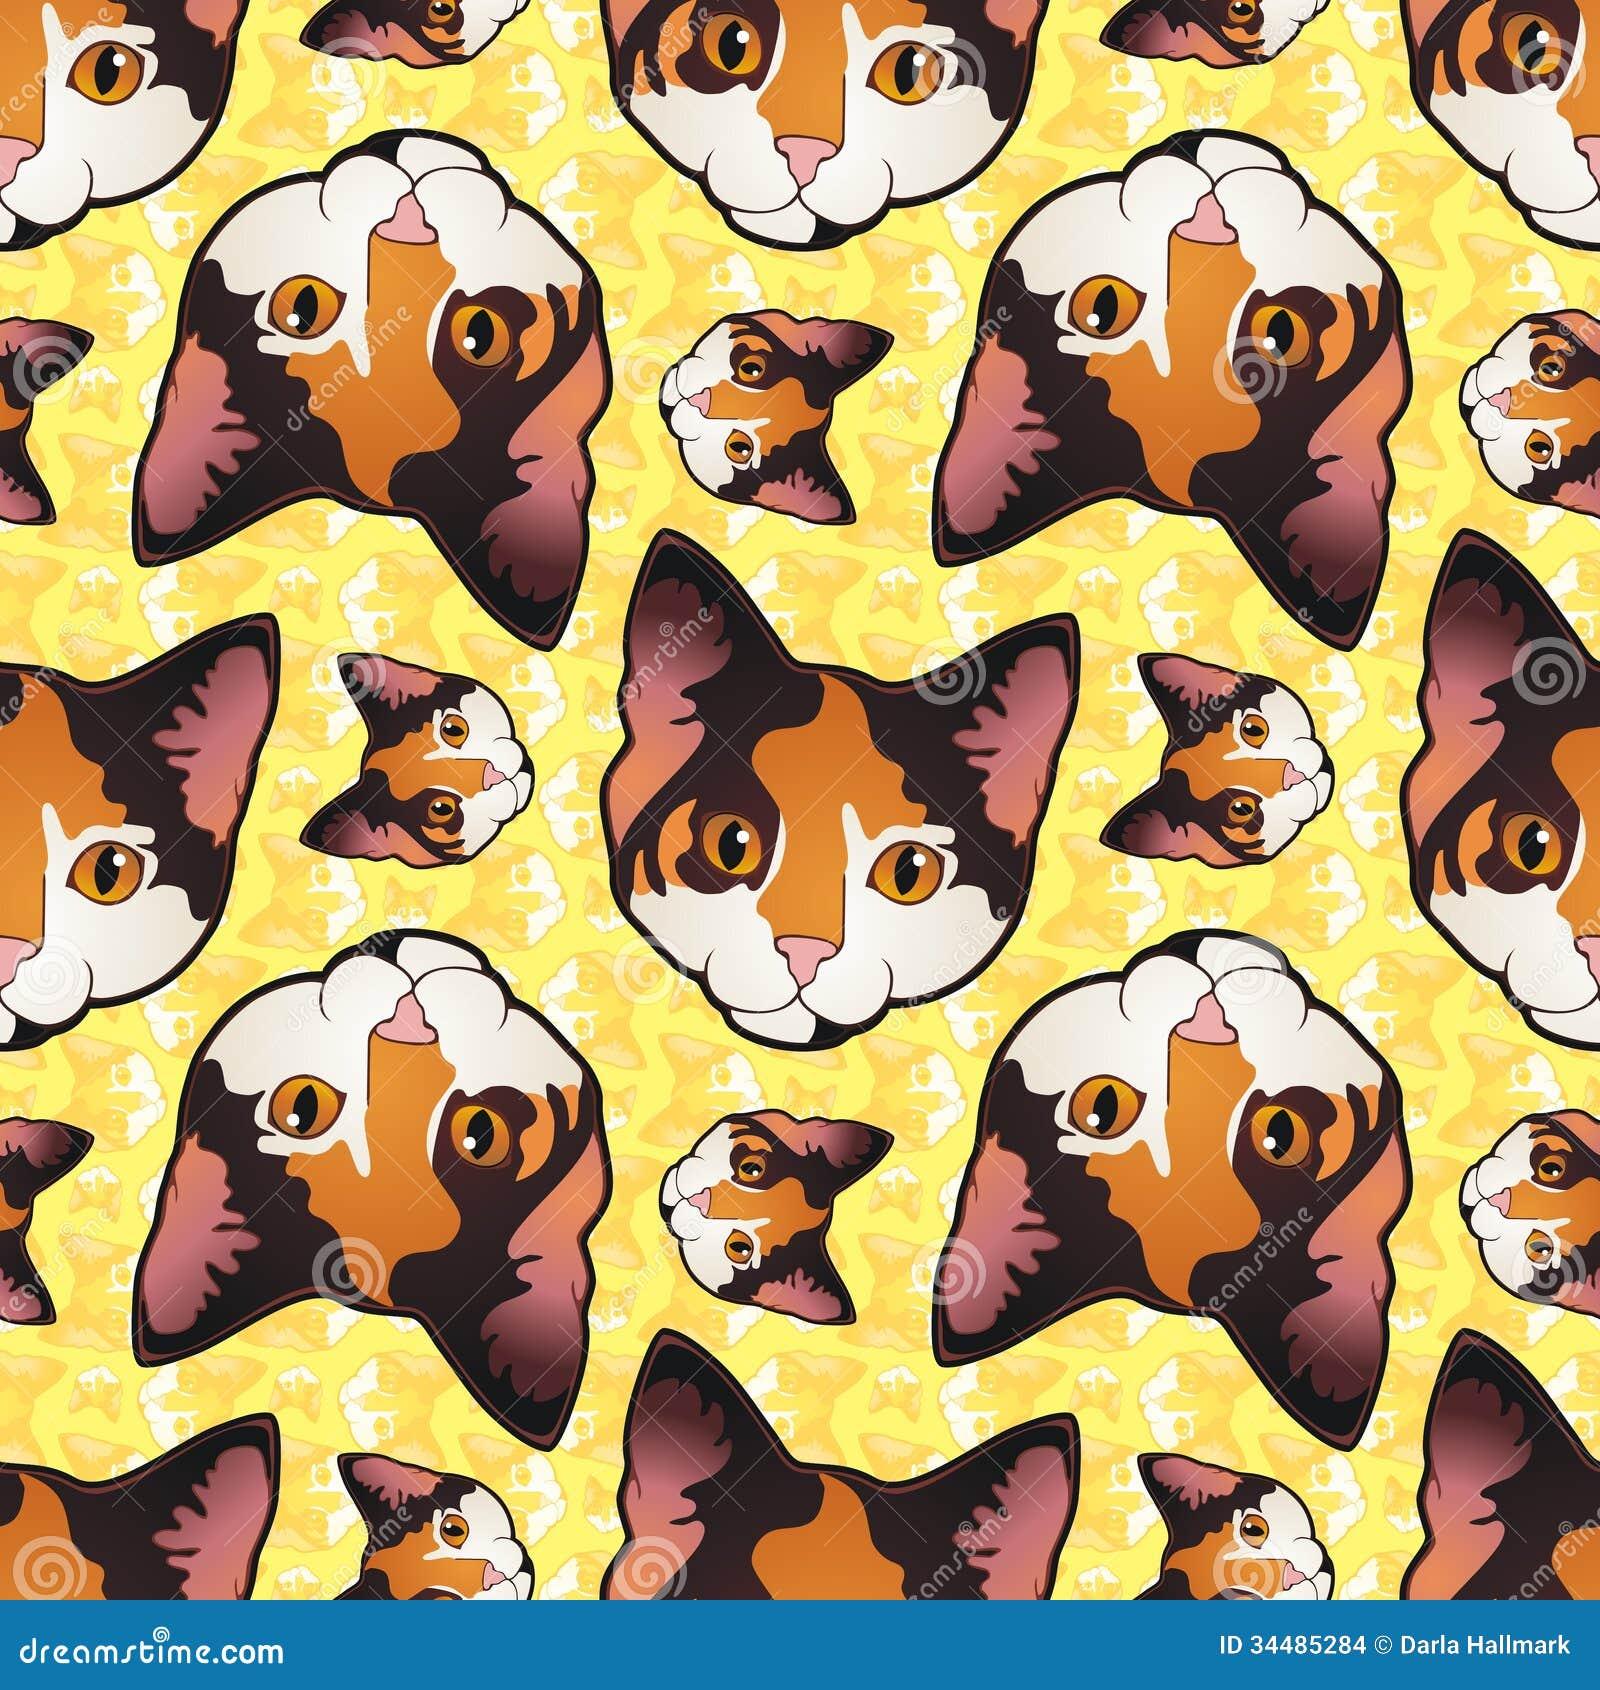 Calico Kitty Wallpaper Stock Illustration Illustration Of Pattern